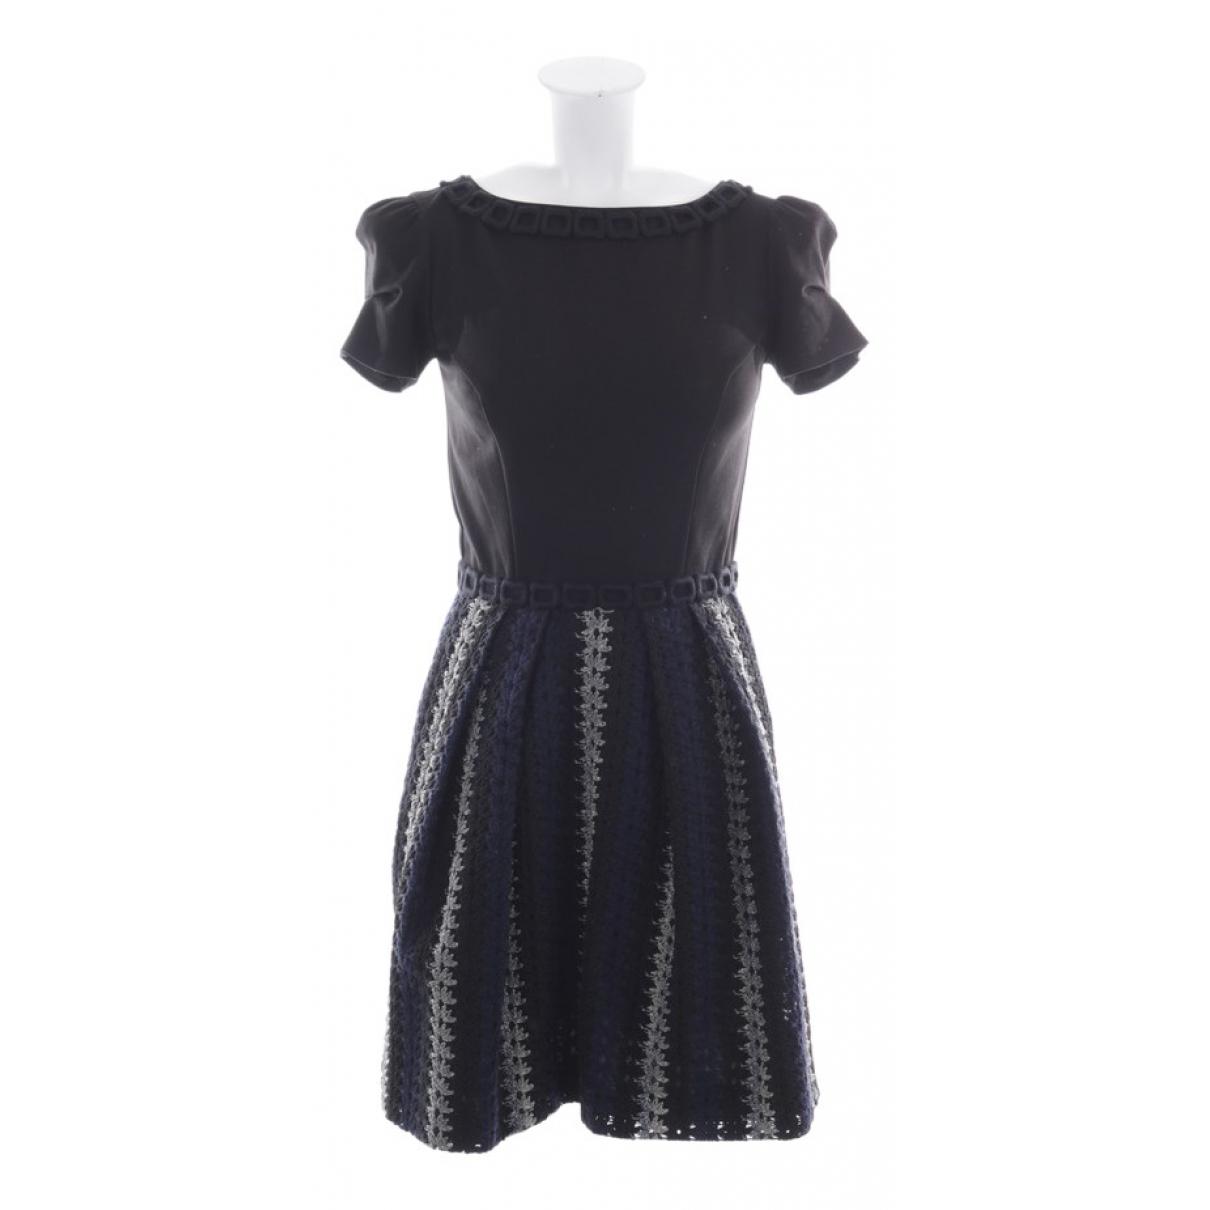 Blumarine \N Kleid in  Schwarz Viskose